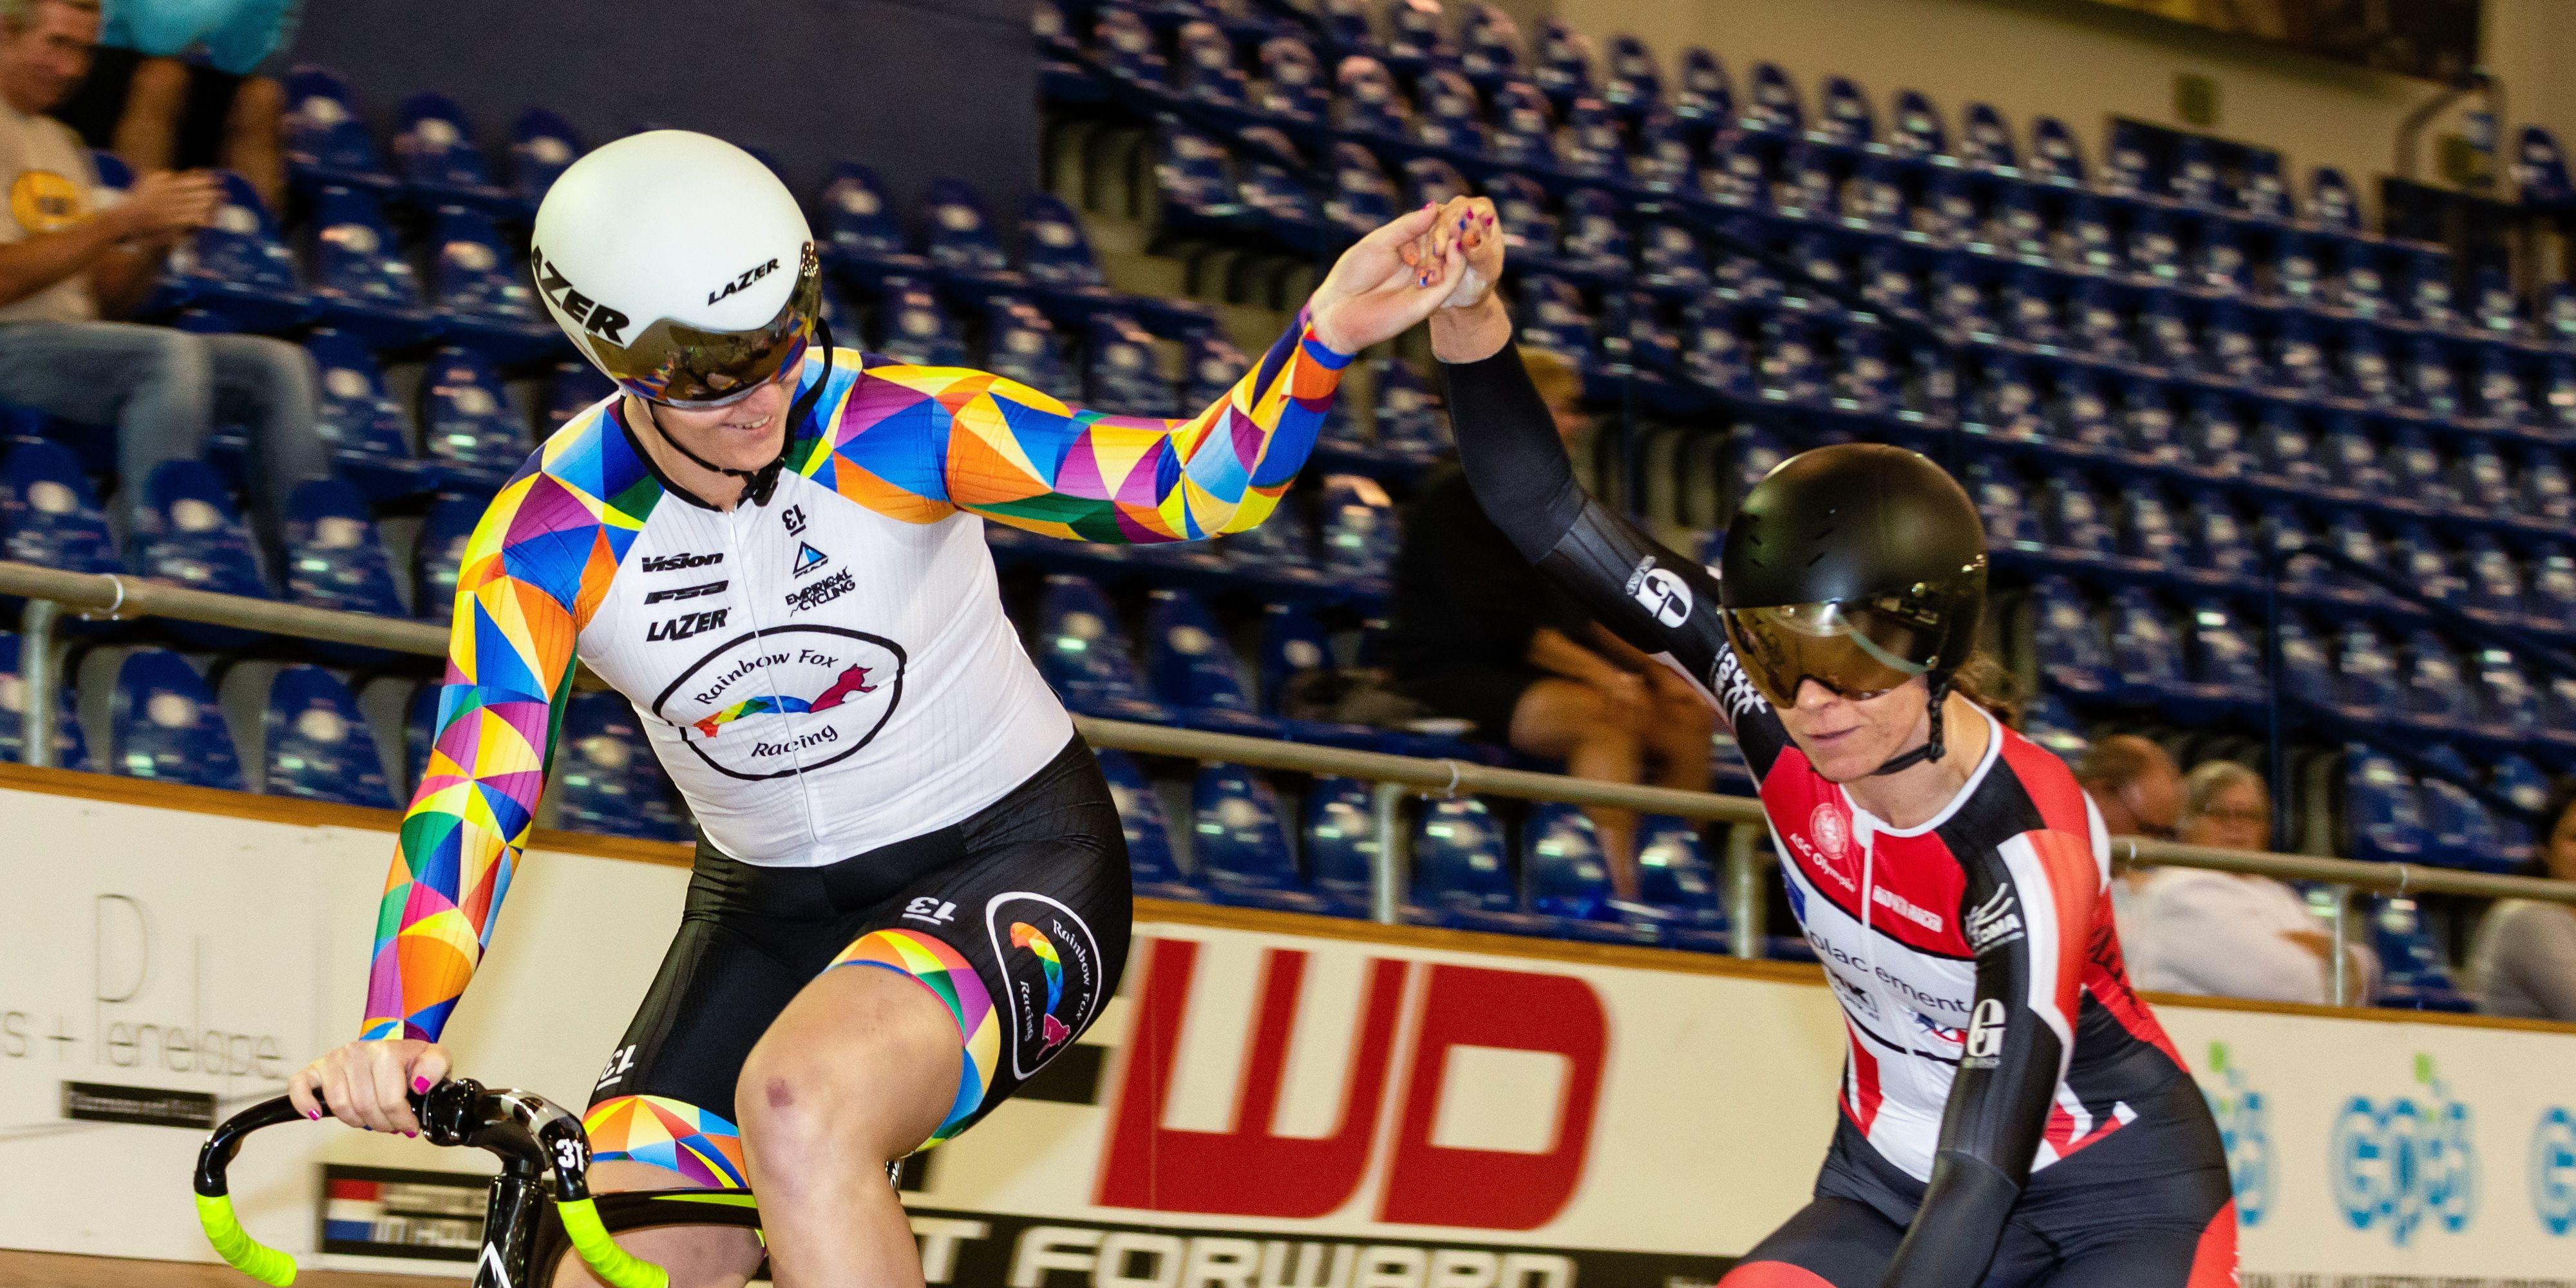 2018 UCI Masters Track Cycling World Championships